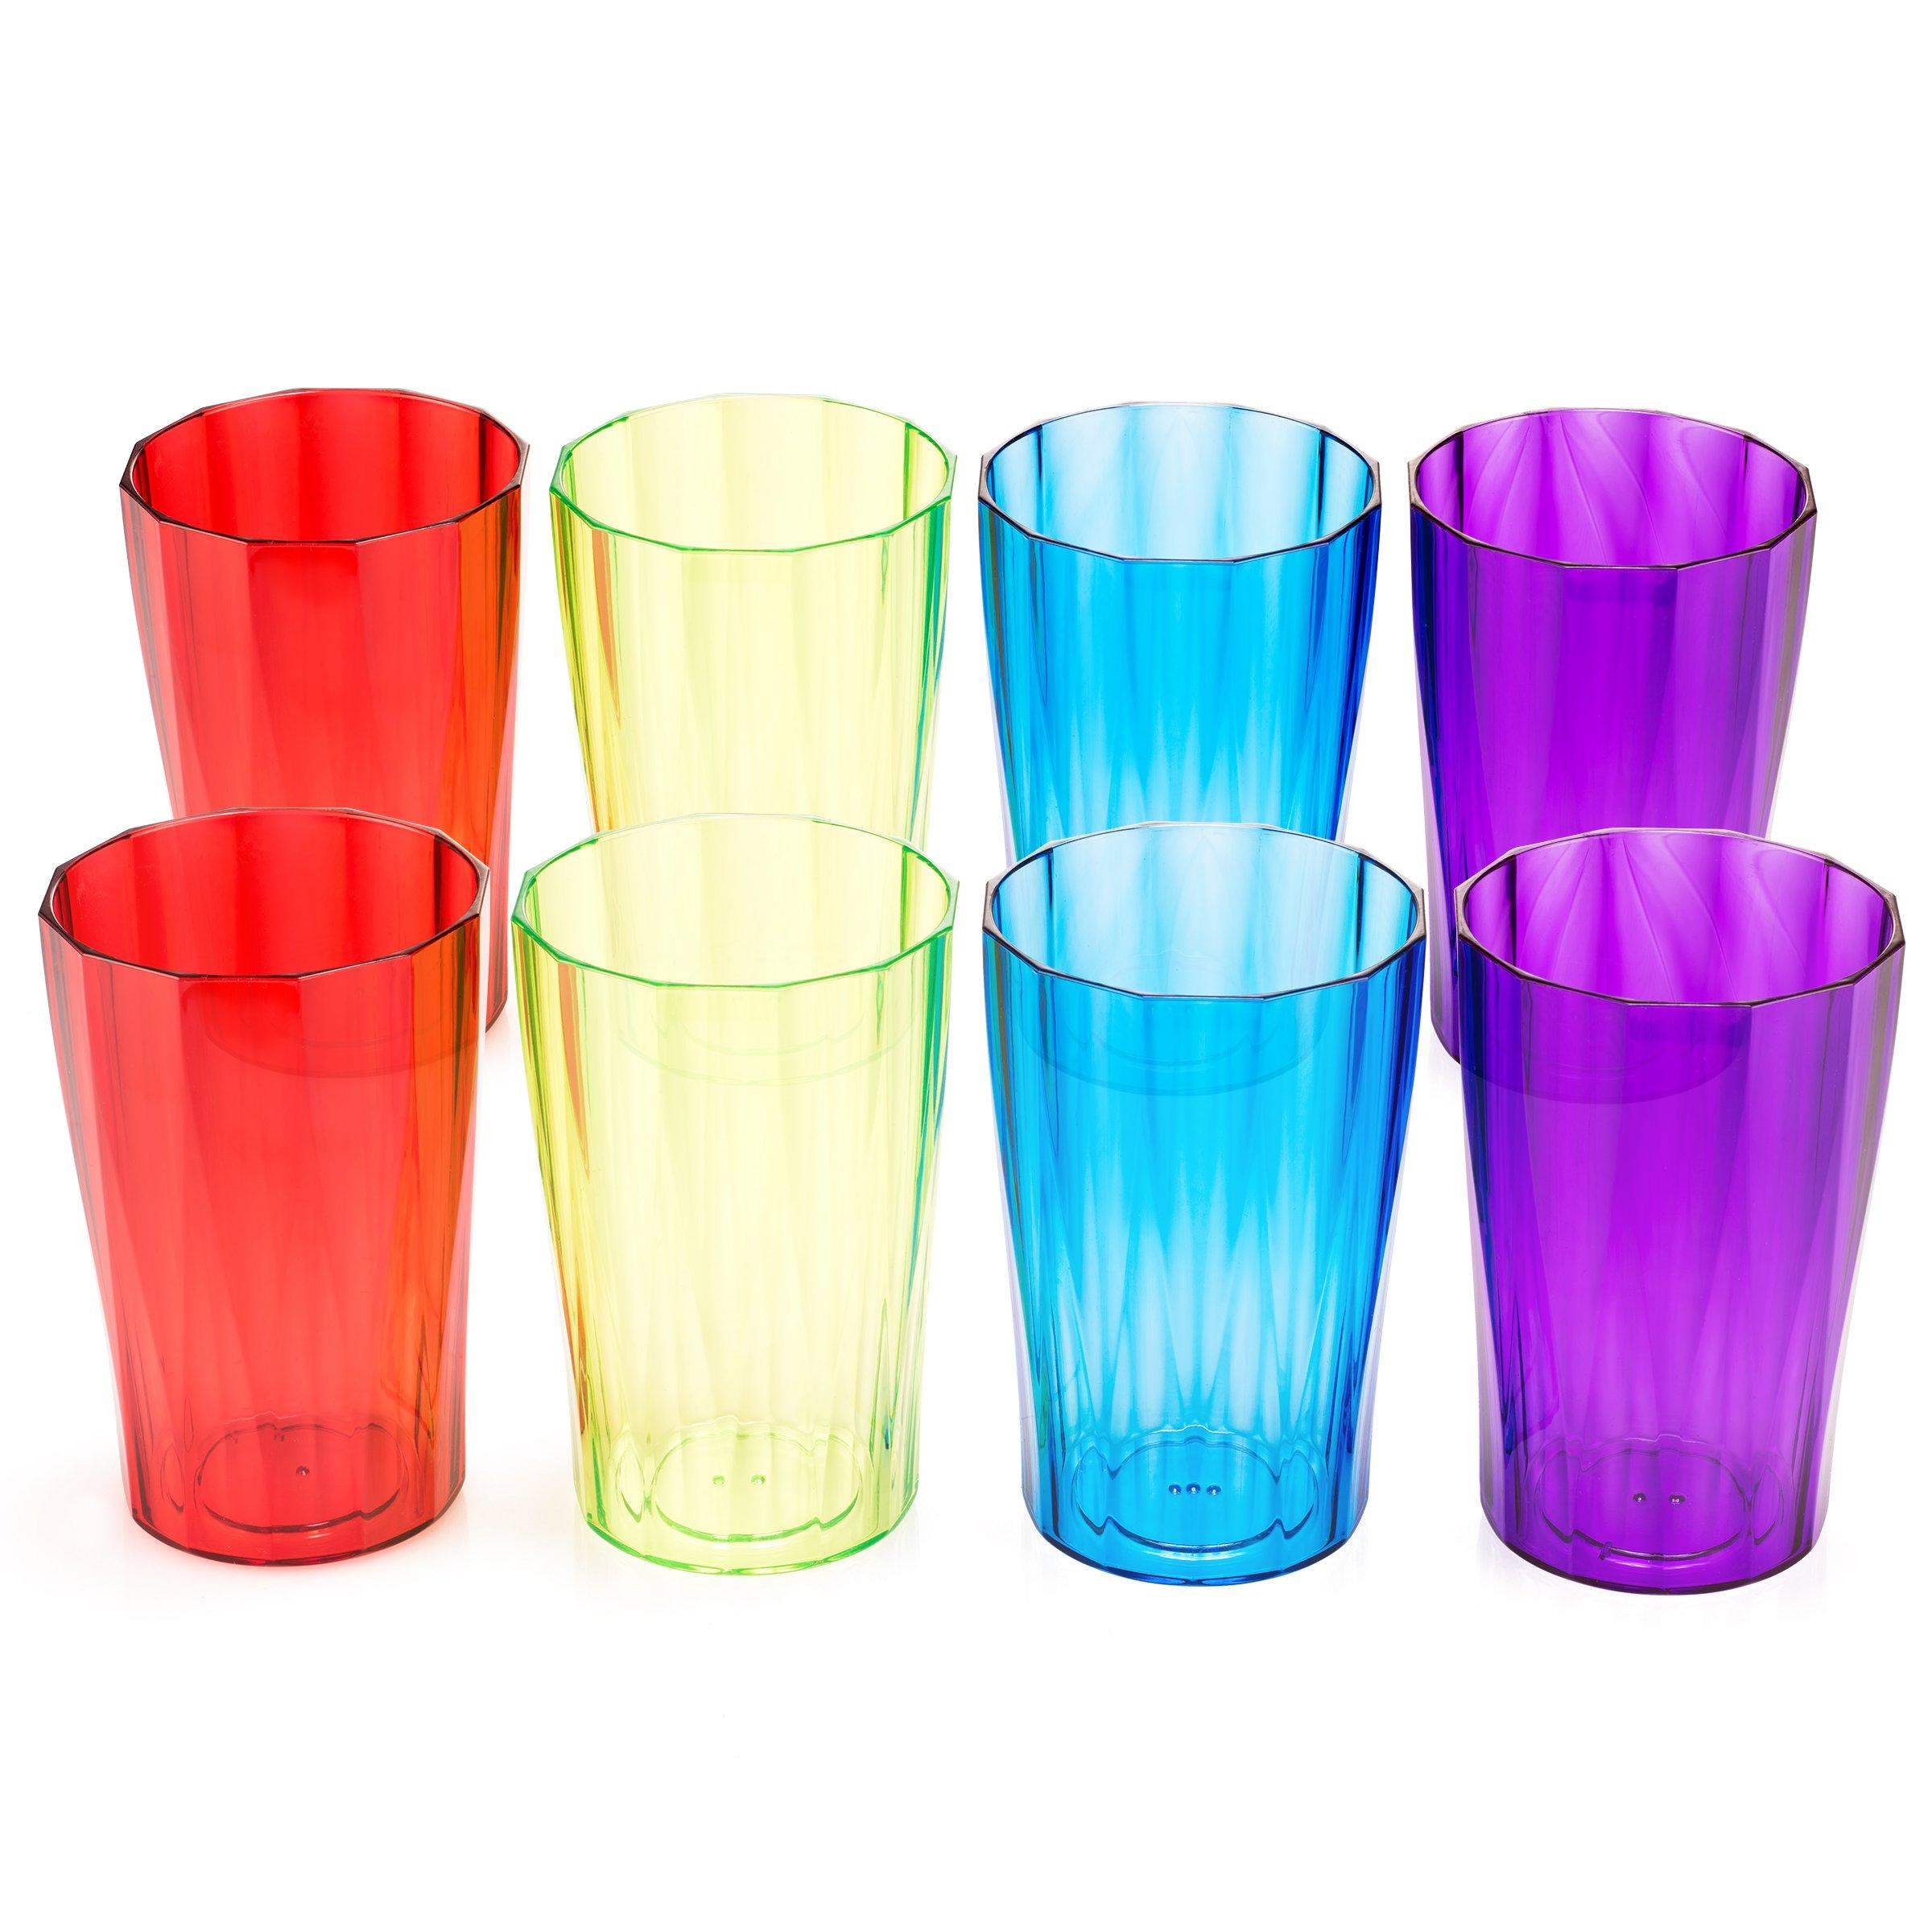 Plastic Glasses Set by Spogears. Plastic Drinking Glasses Set Includes 8 Plastic Tumblers. Looks Like Real Crystal Glasses, Unbreakable Glasses, Dishwasher Safe, BPA Free, Elegant Design.